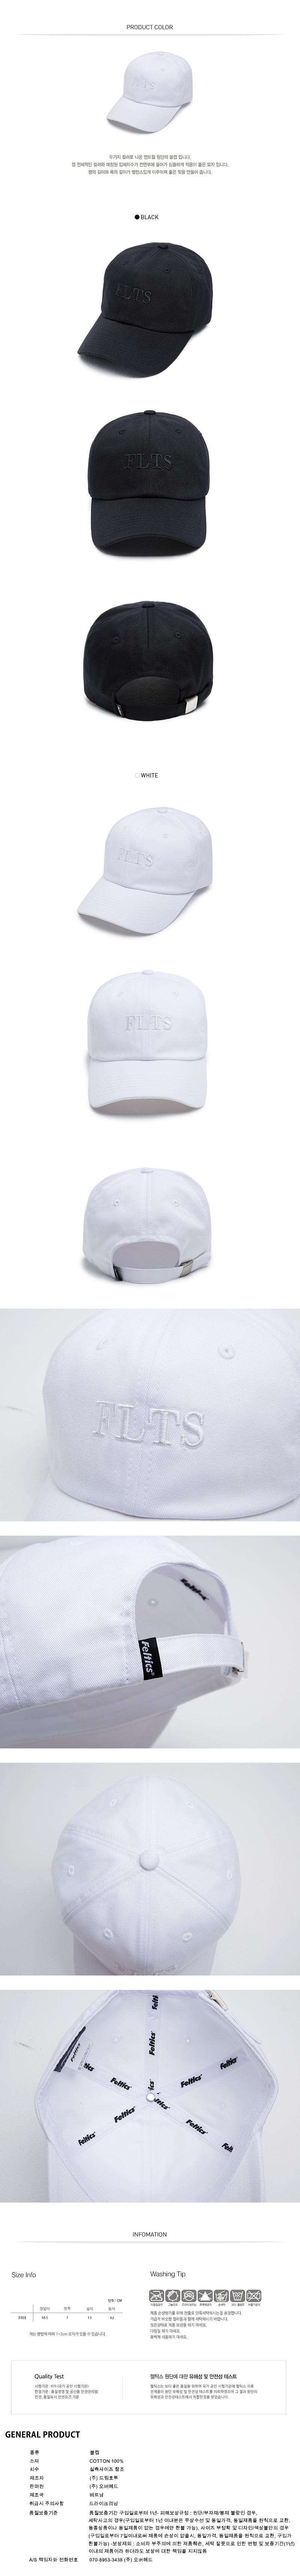 [ FELTICS ] [ FELTICS ] FLTS 文本带帽白色(FEPFMCA37)